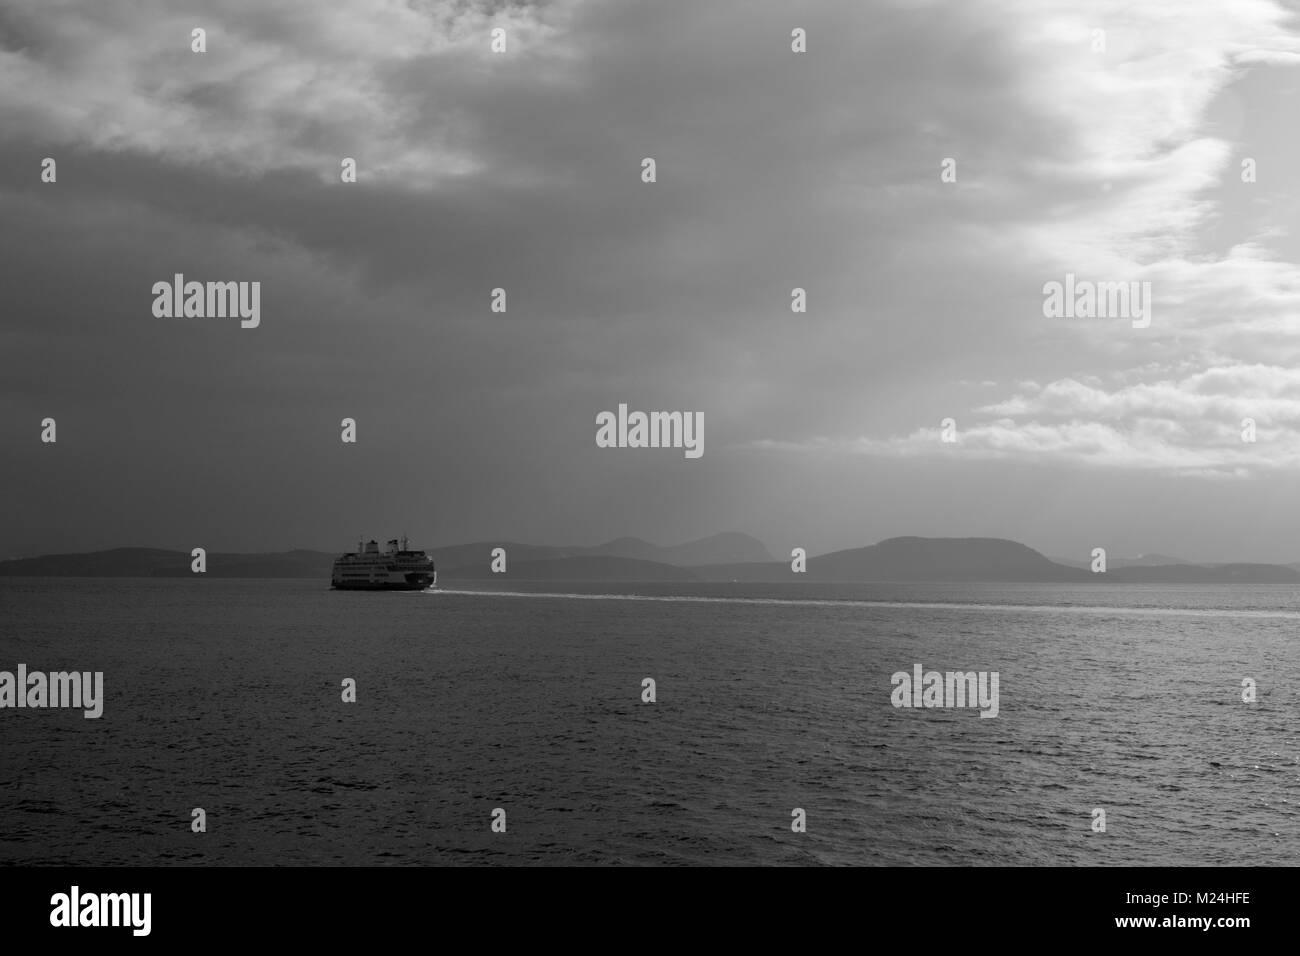 Washington State Ferry in the Straight of Juan de Fuca. - Stock Image